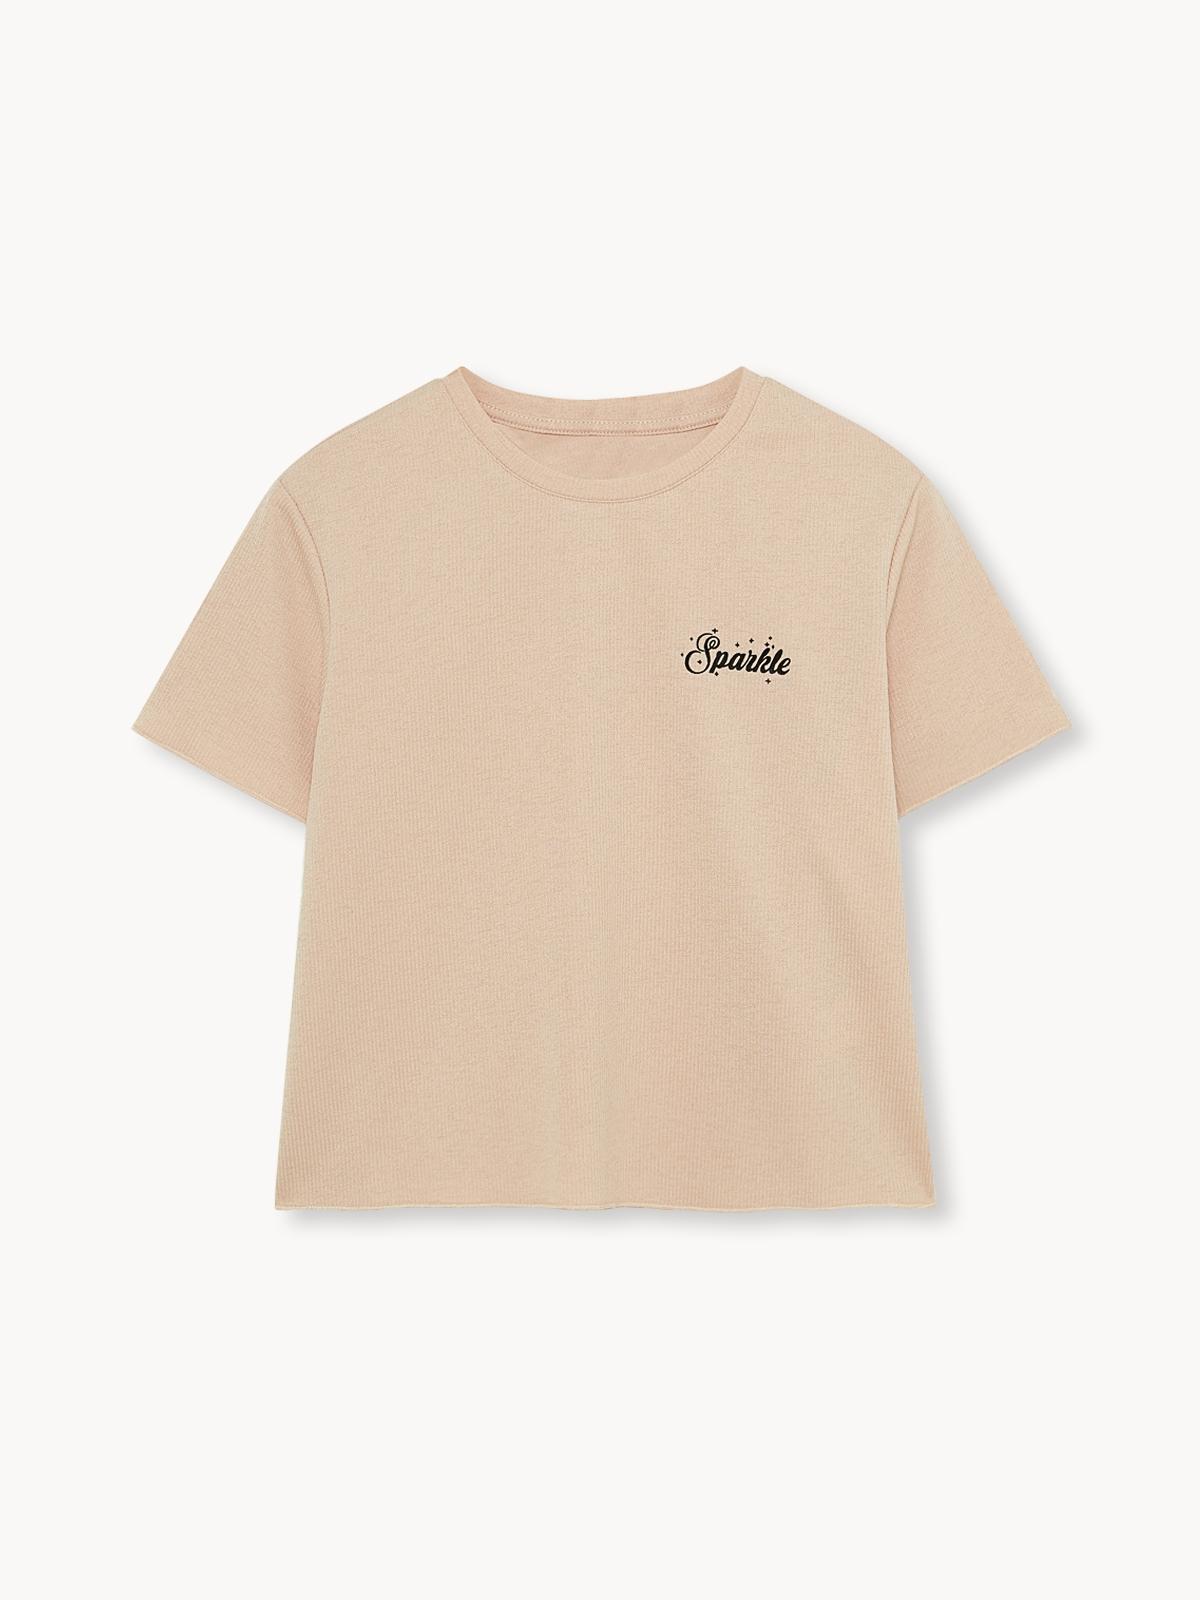 Sparkle Crew Neck Pyjama Top Cream